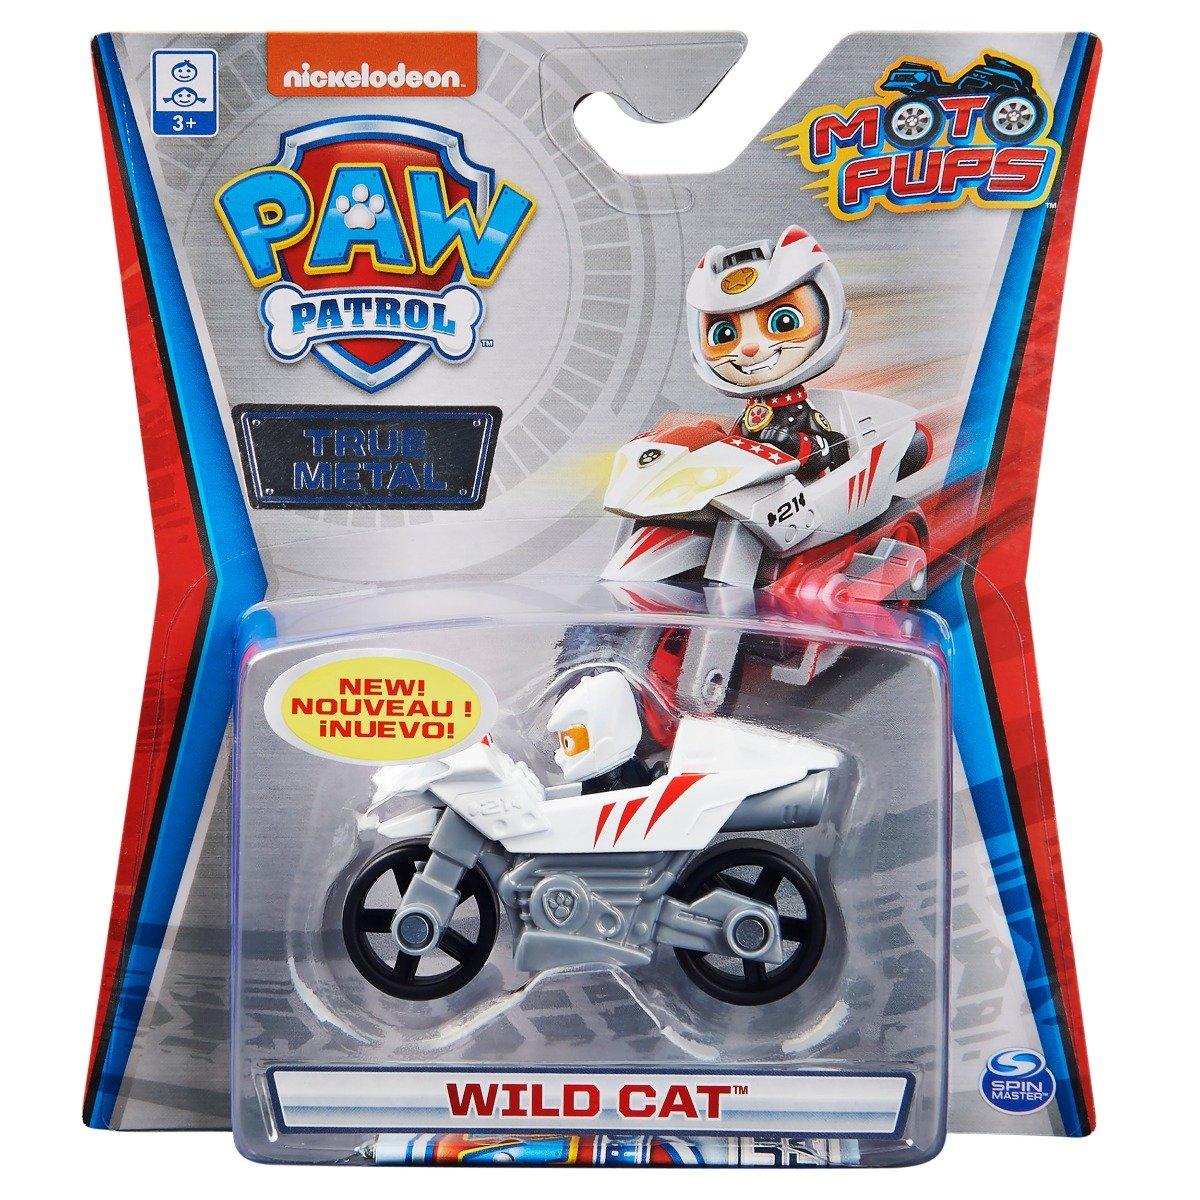 Masinuta cu figurina Paw Patrol True Metal, Wild Cat, 20130497